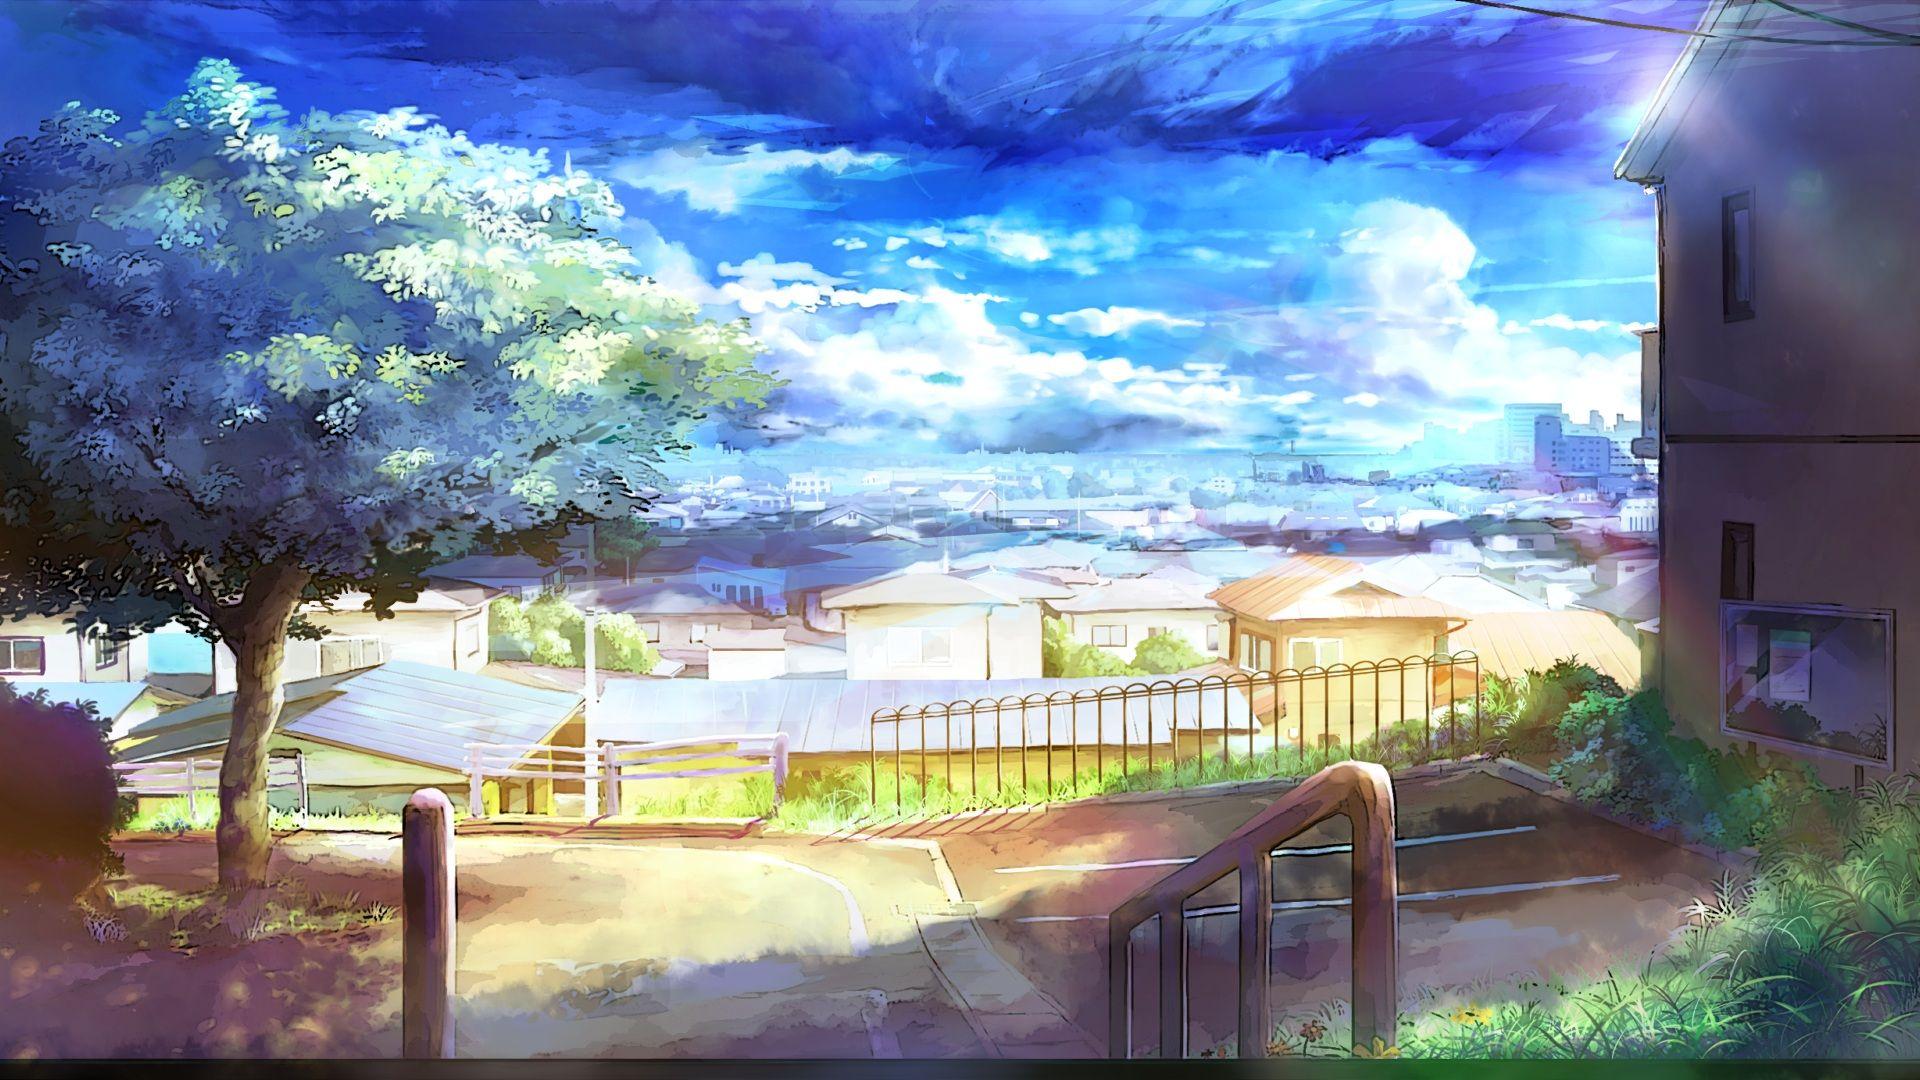 Artistic Anime Scenery Anime Art Beautiful Anime Art Dark